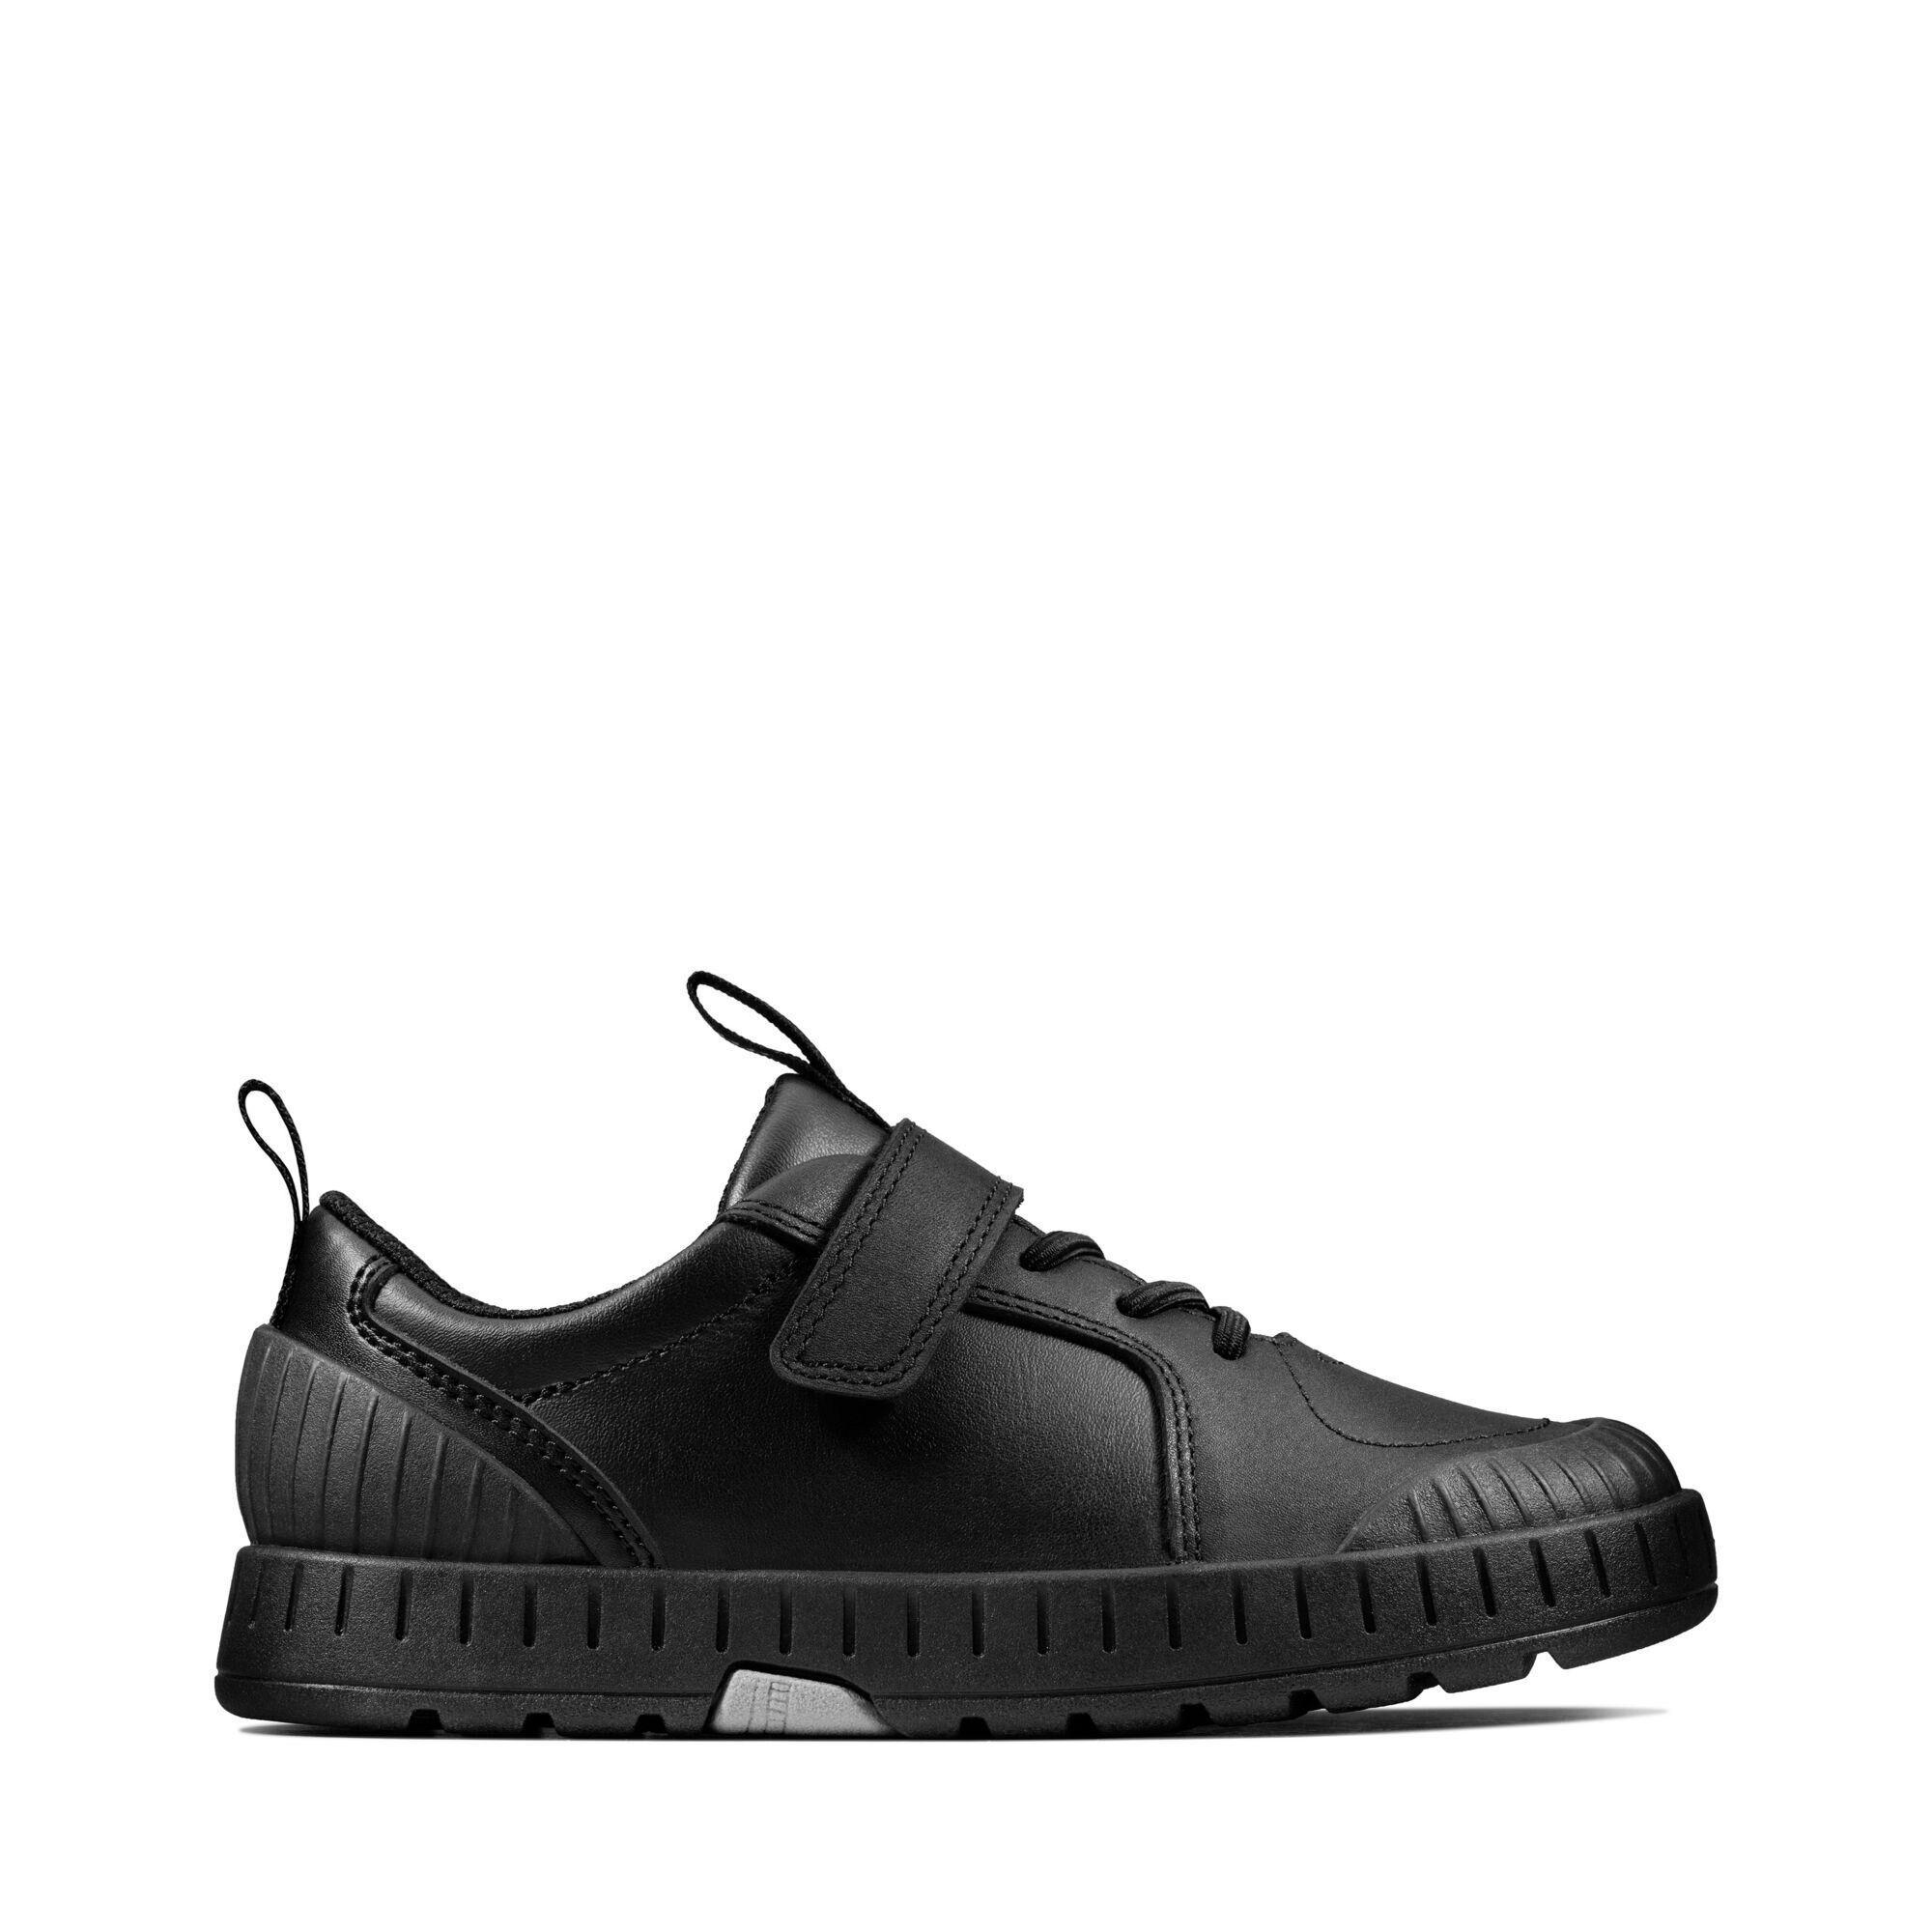 Black Leather Trainers - Apollo Step K